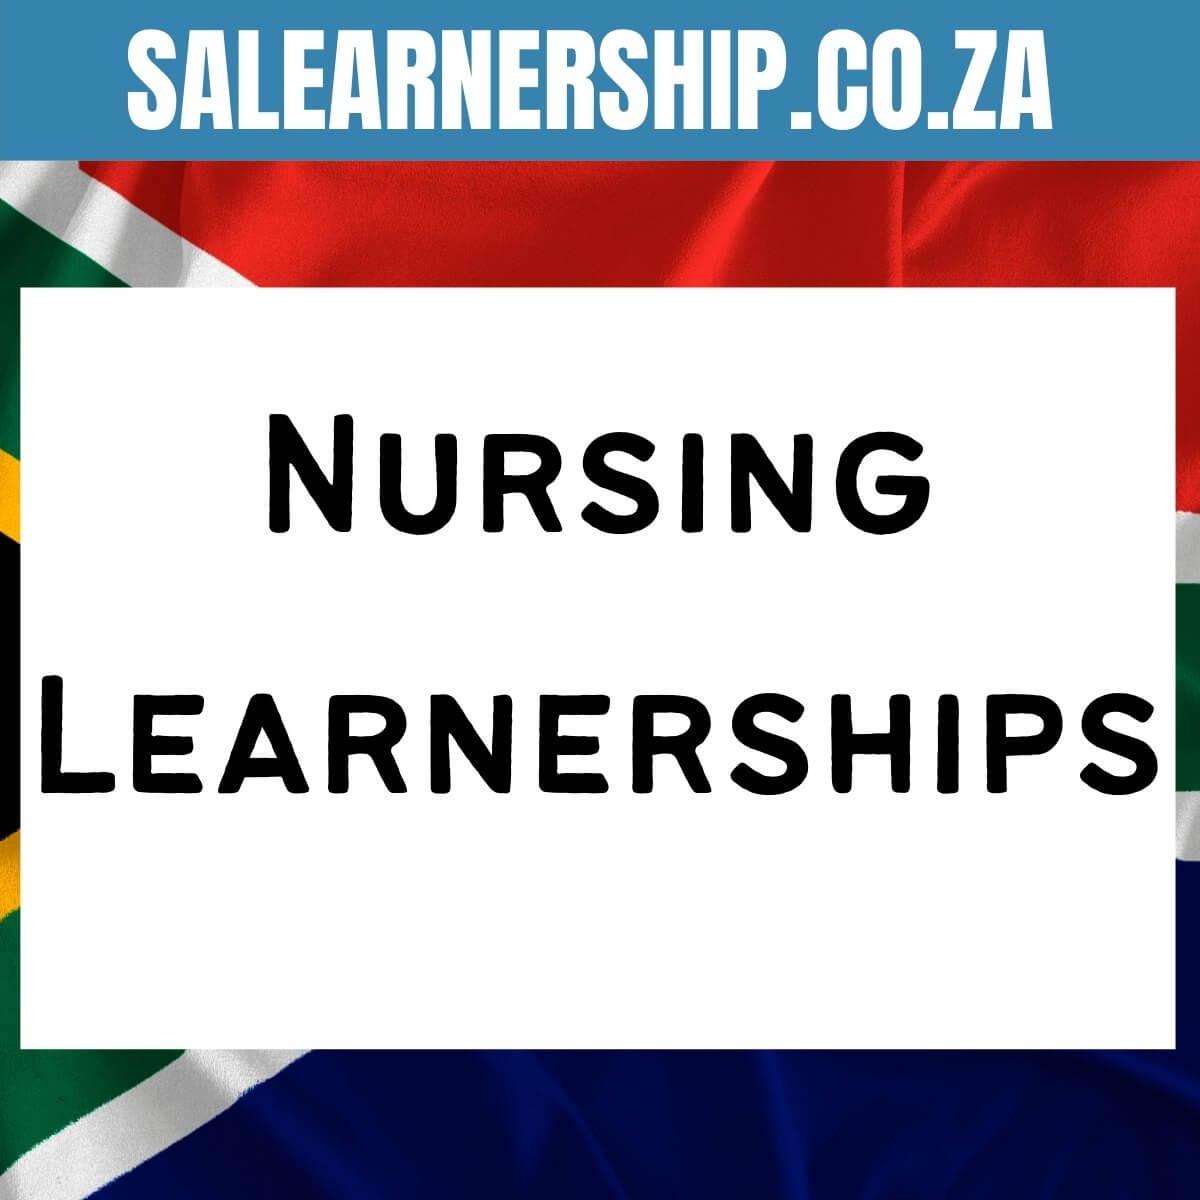 Nursing Learnerships